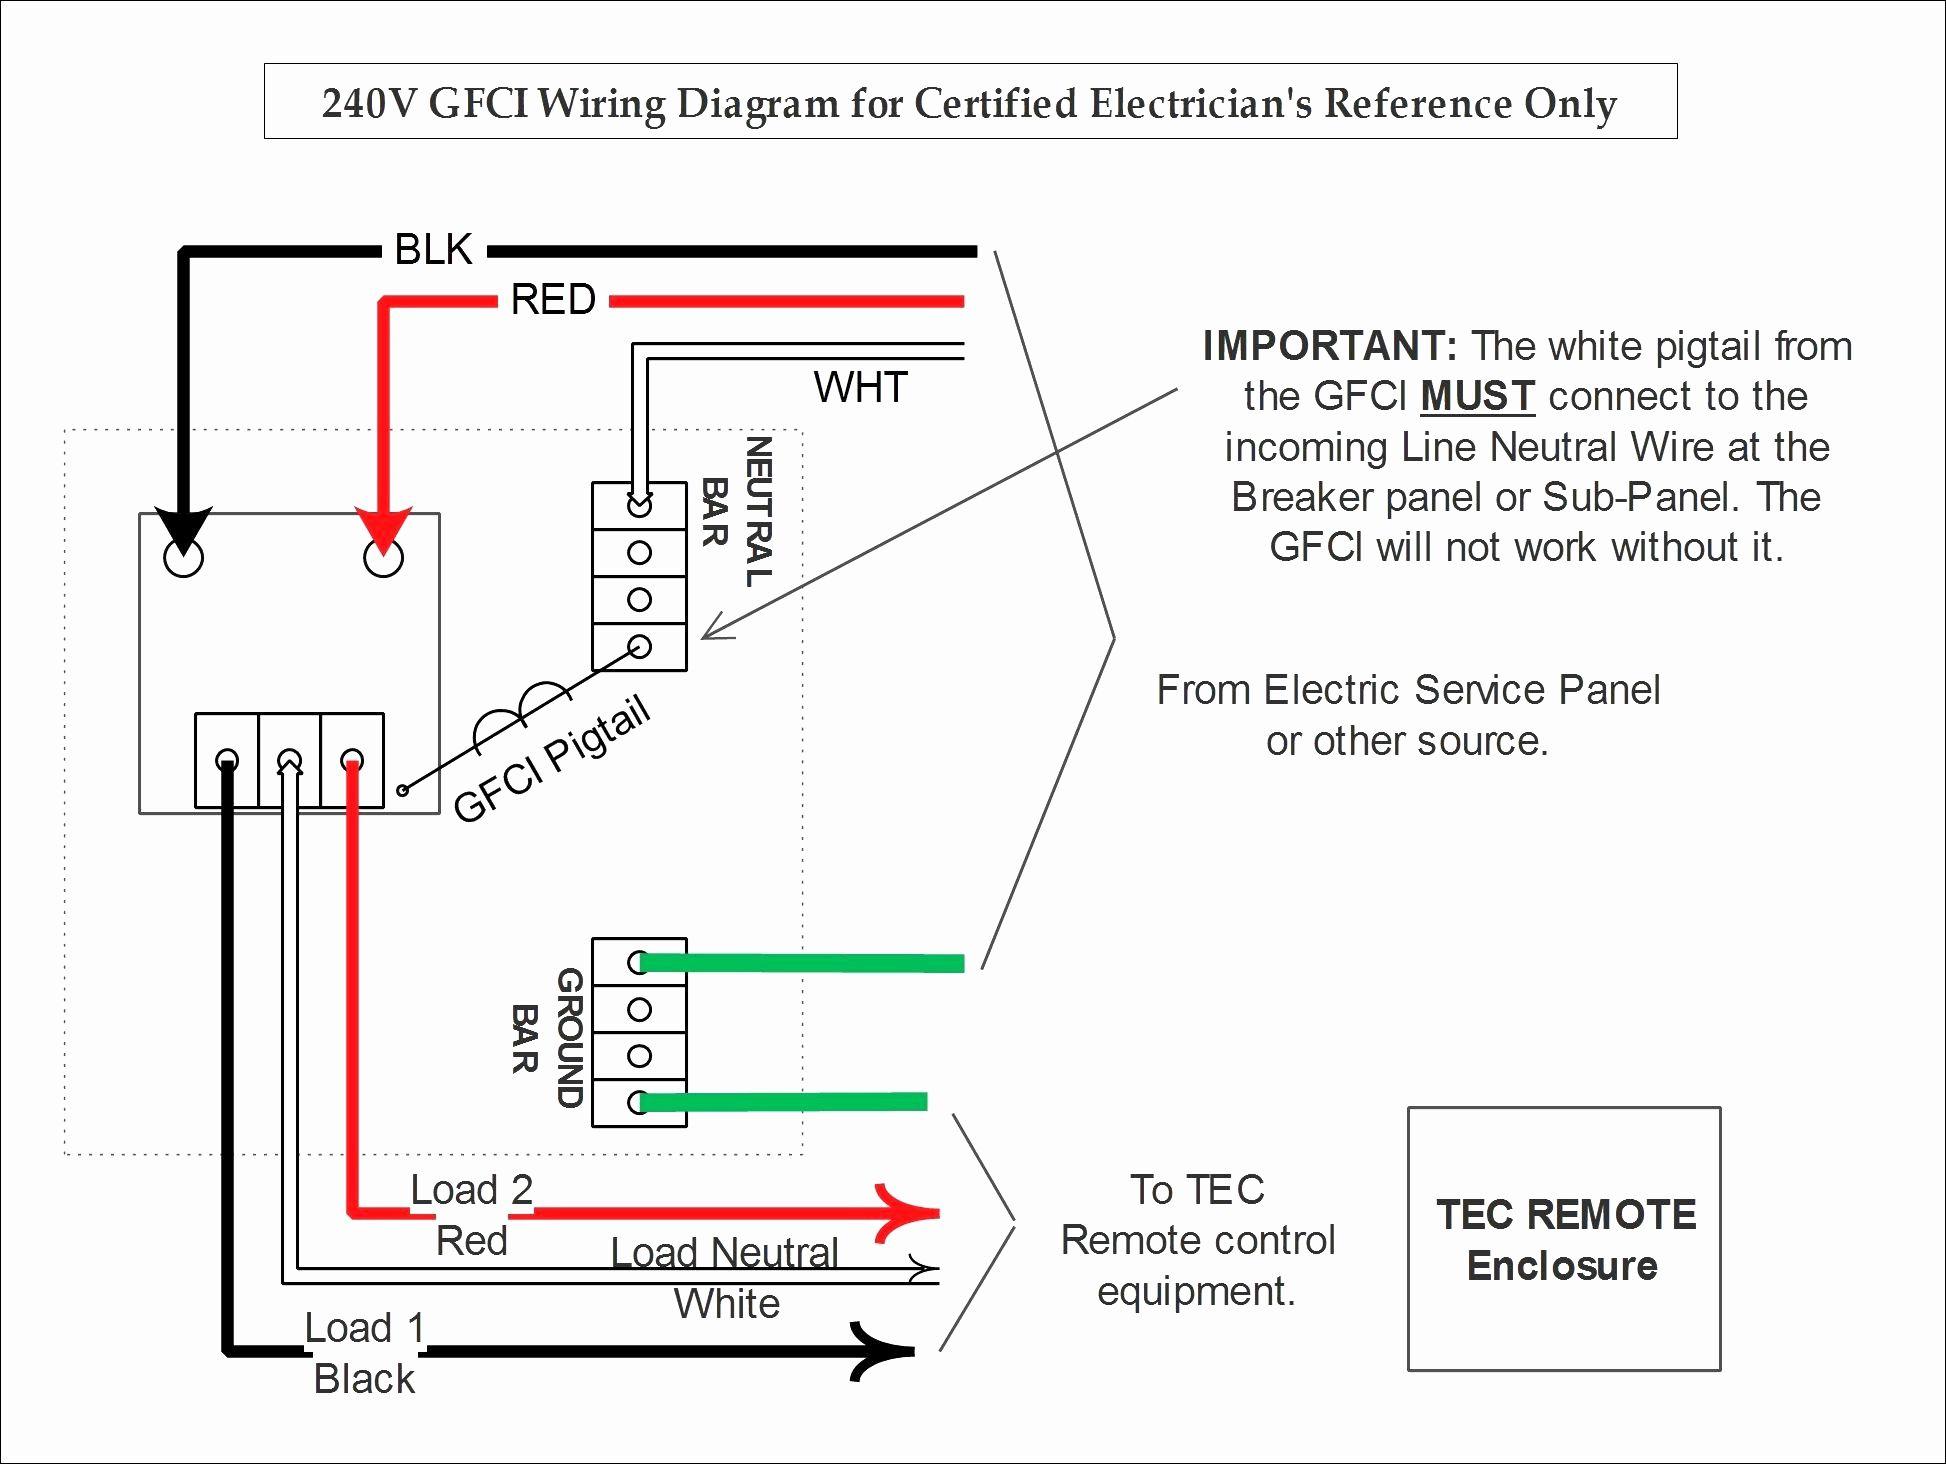 Dayton Unit Heater Wiring Diagram Inspirational Dayton Electric - Dayton Electric Motors Wiring Diagram Download